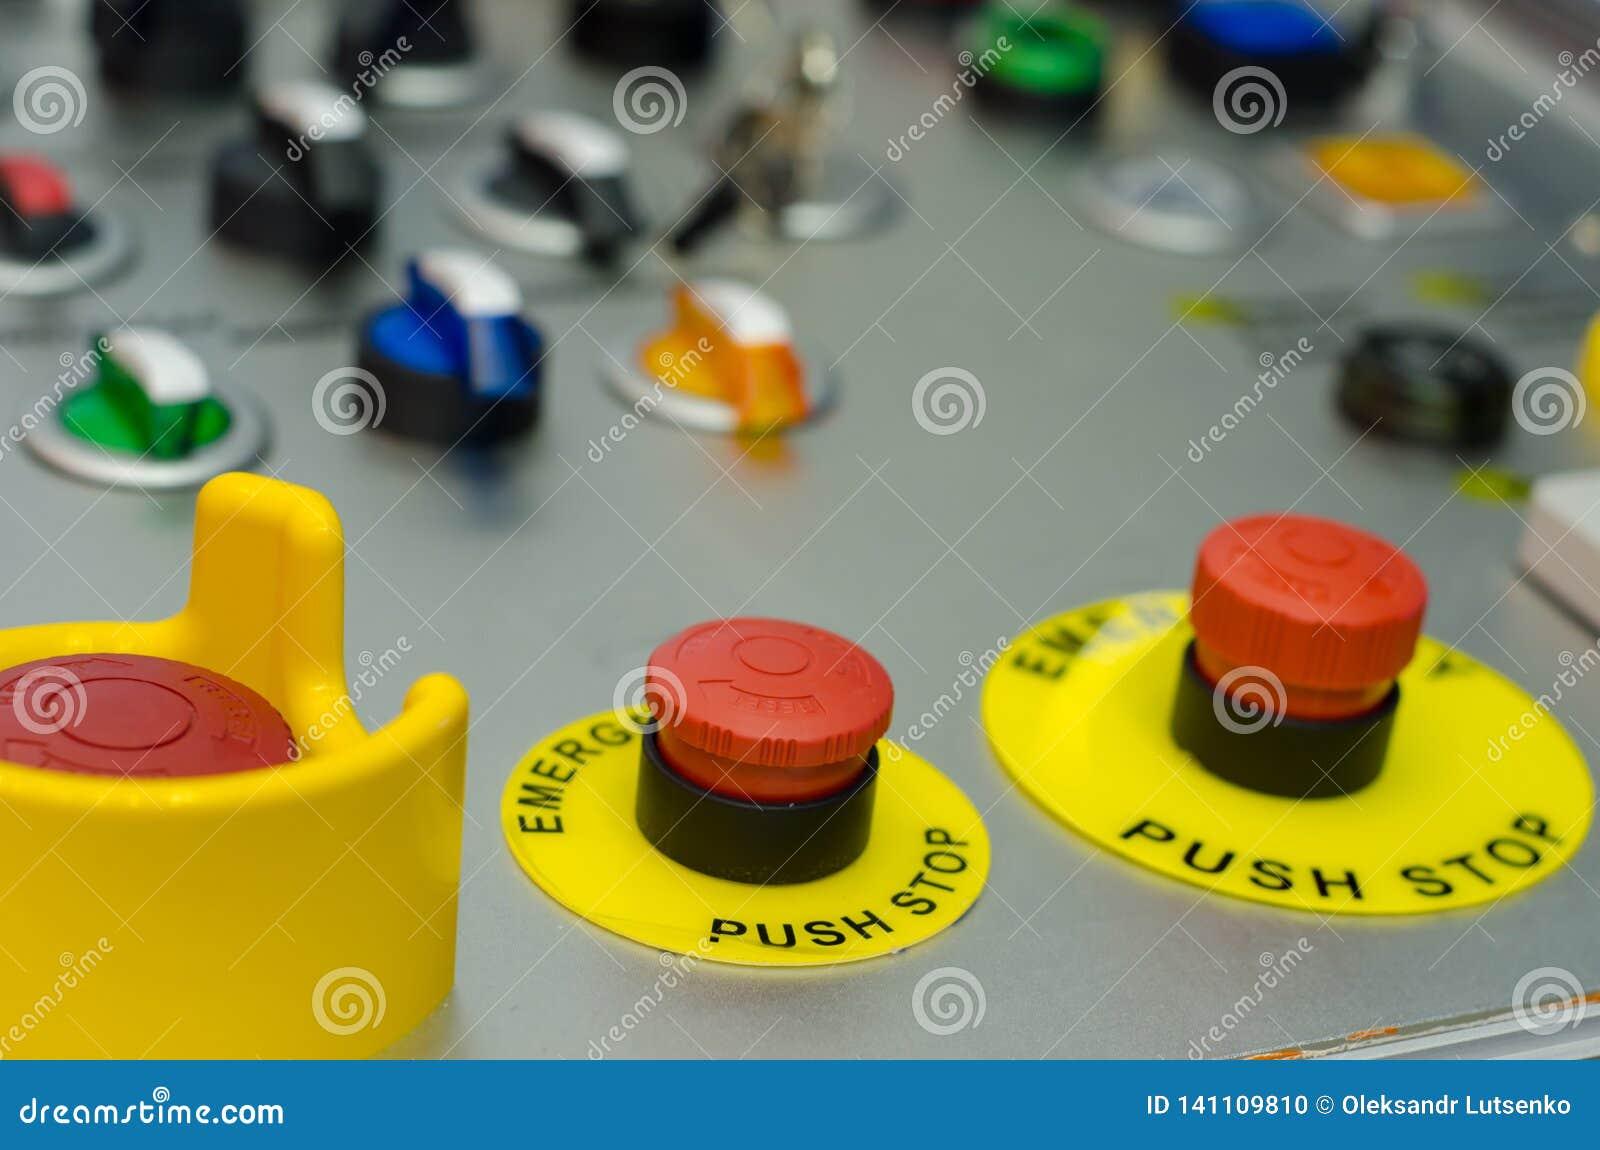 Painel de controle com botões, chave e interruptor